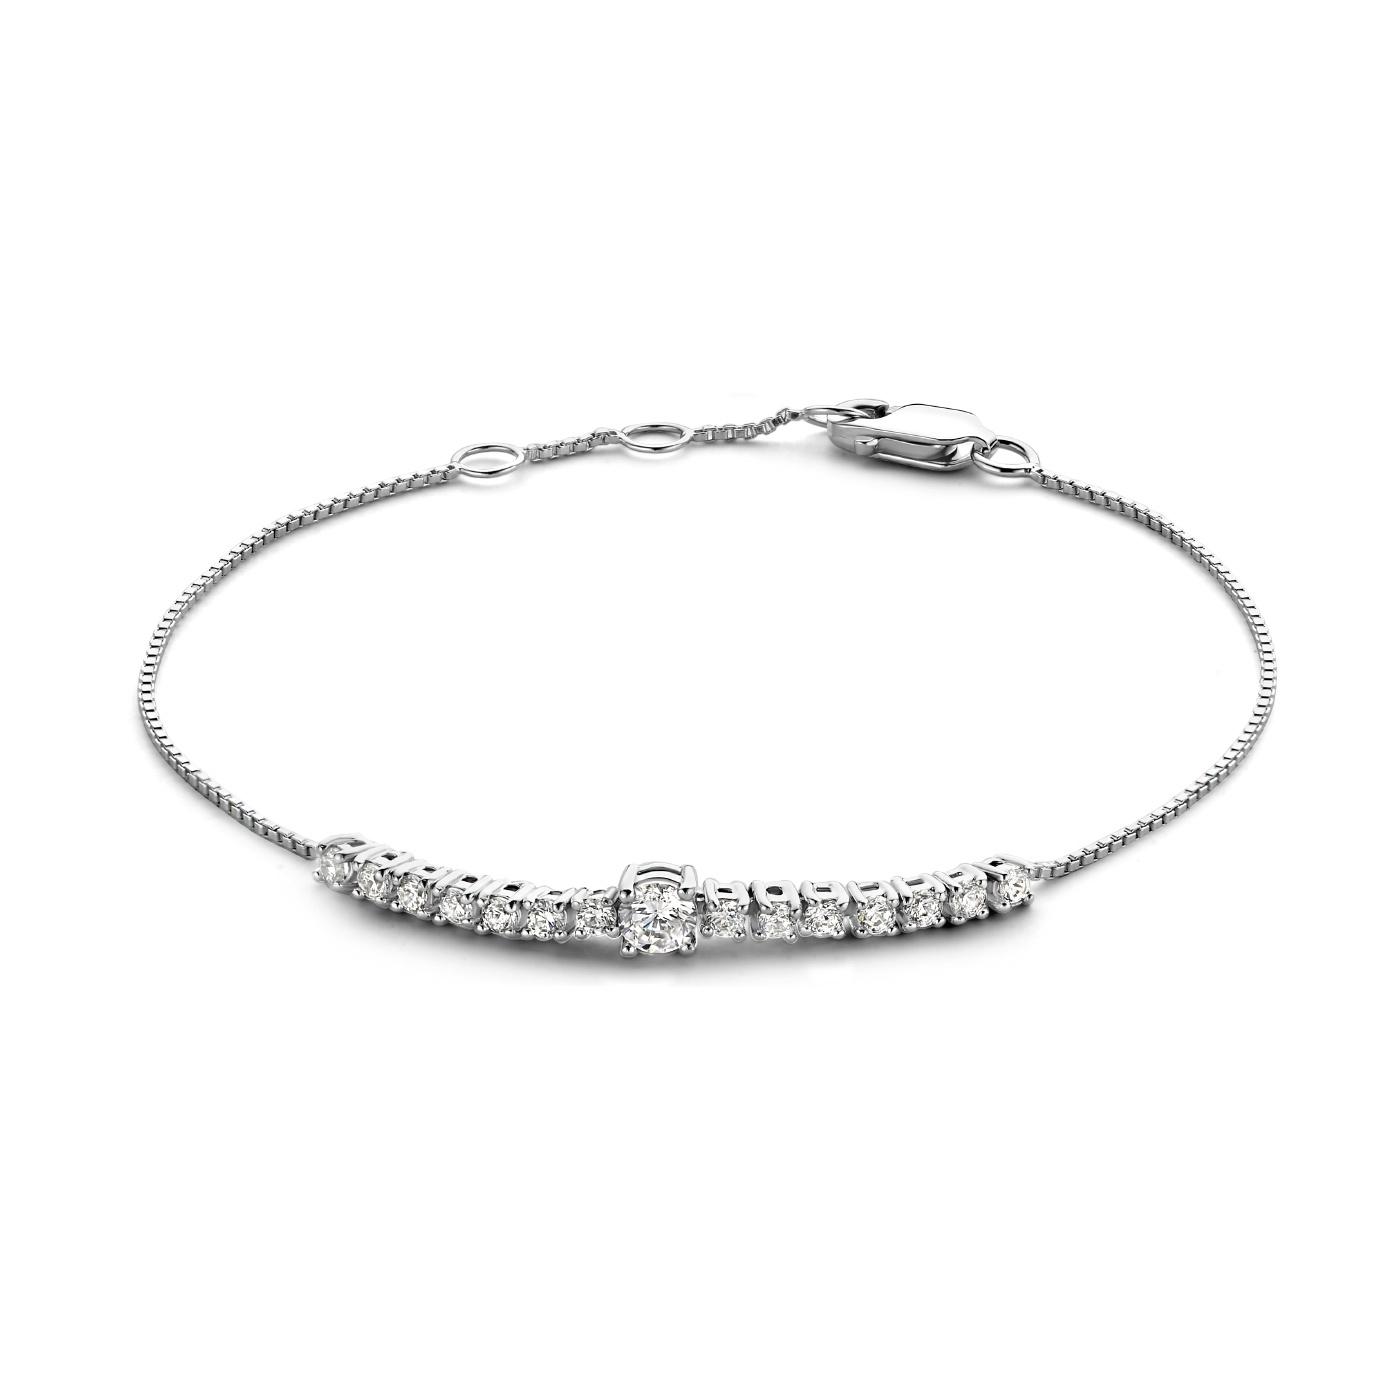 Parte di Me Ponte Vecchio Santa Trinita 925 sterling silver bracelet with zirconia